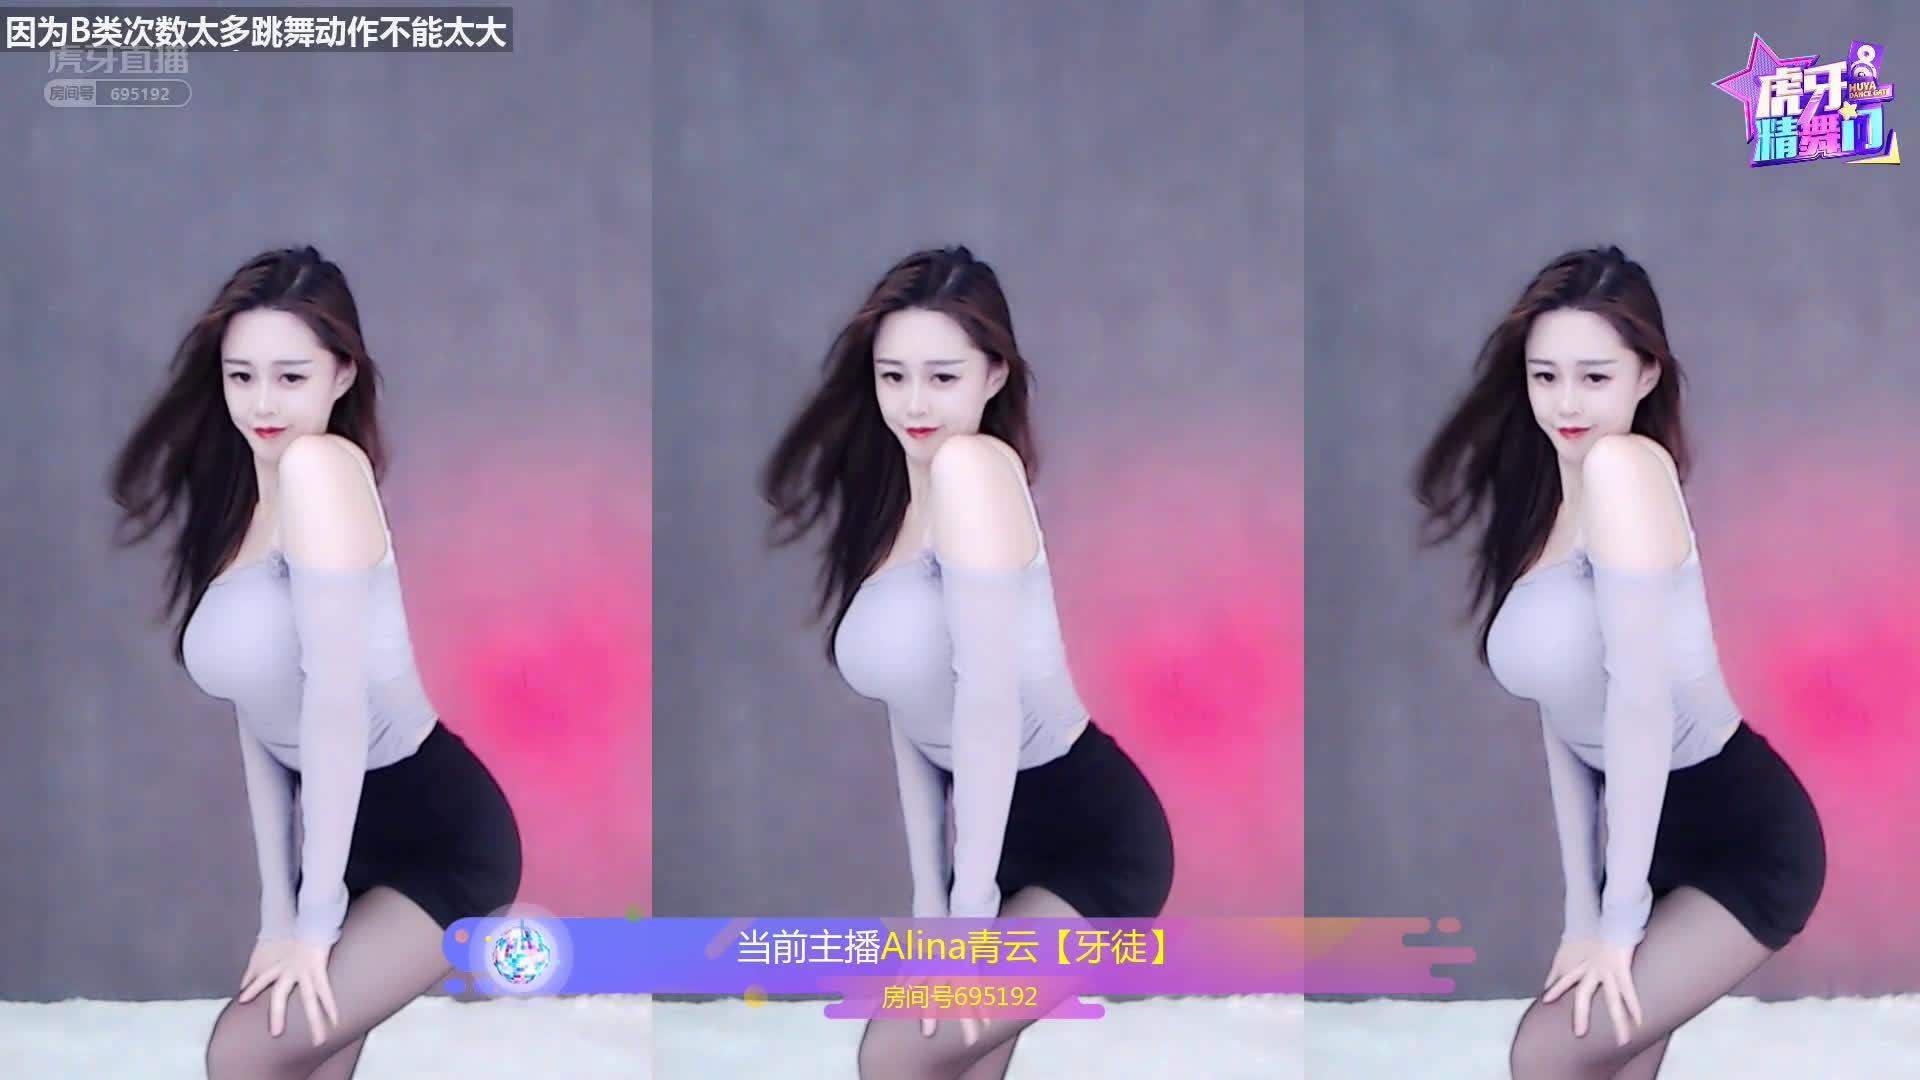 Alina青云